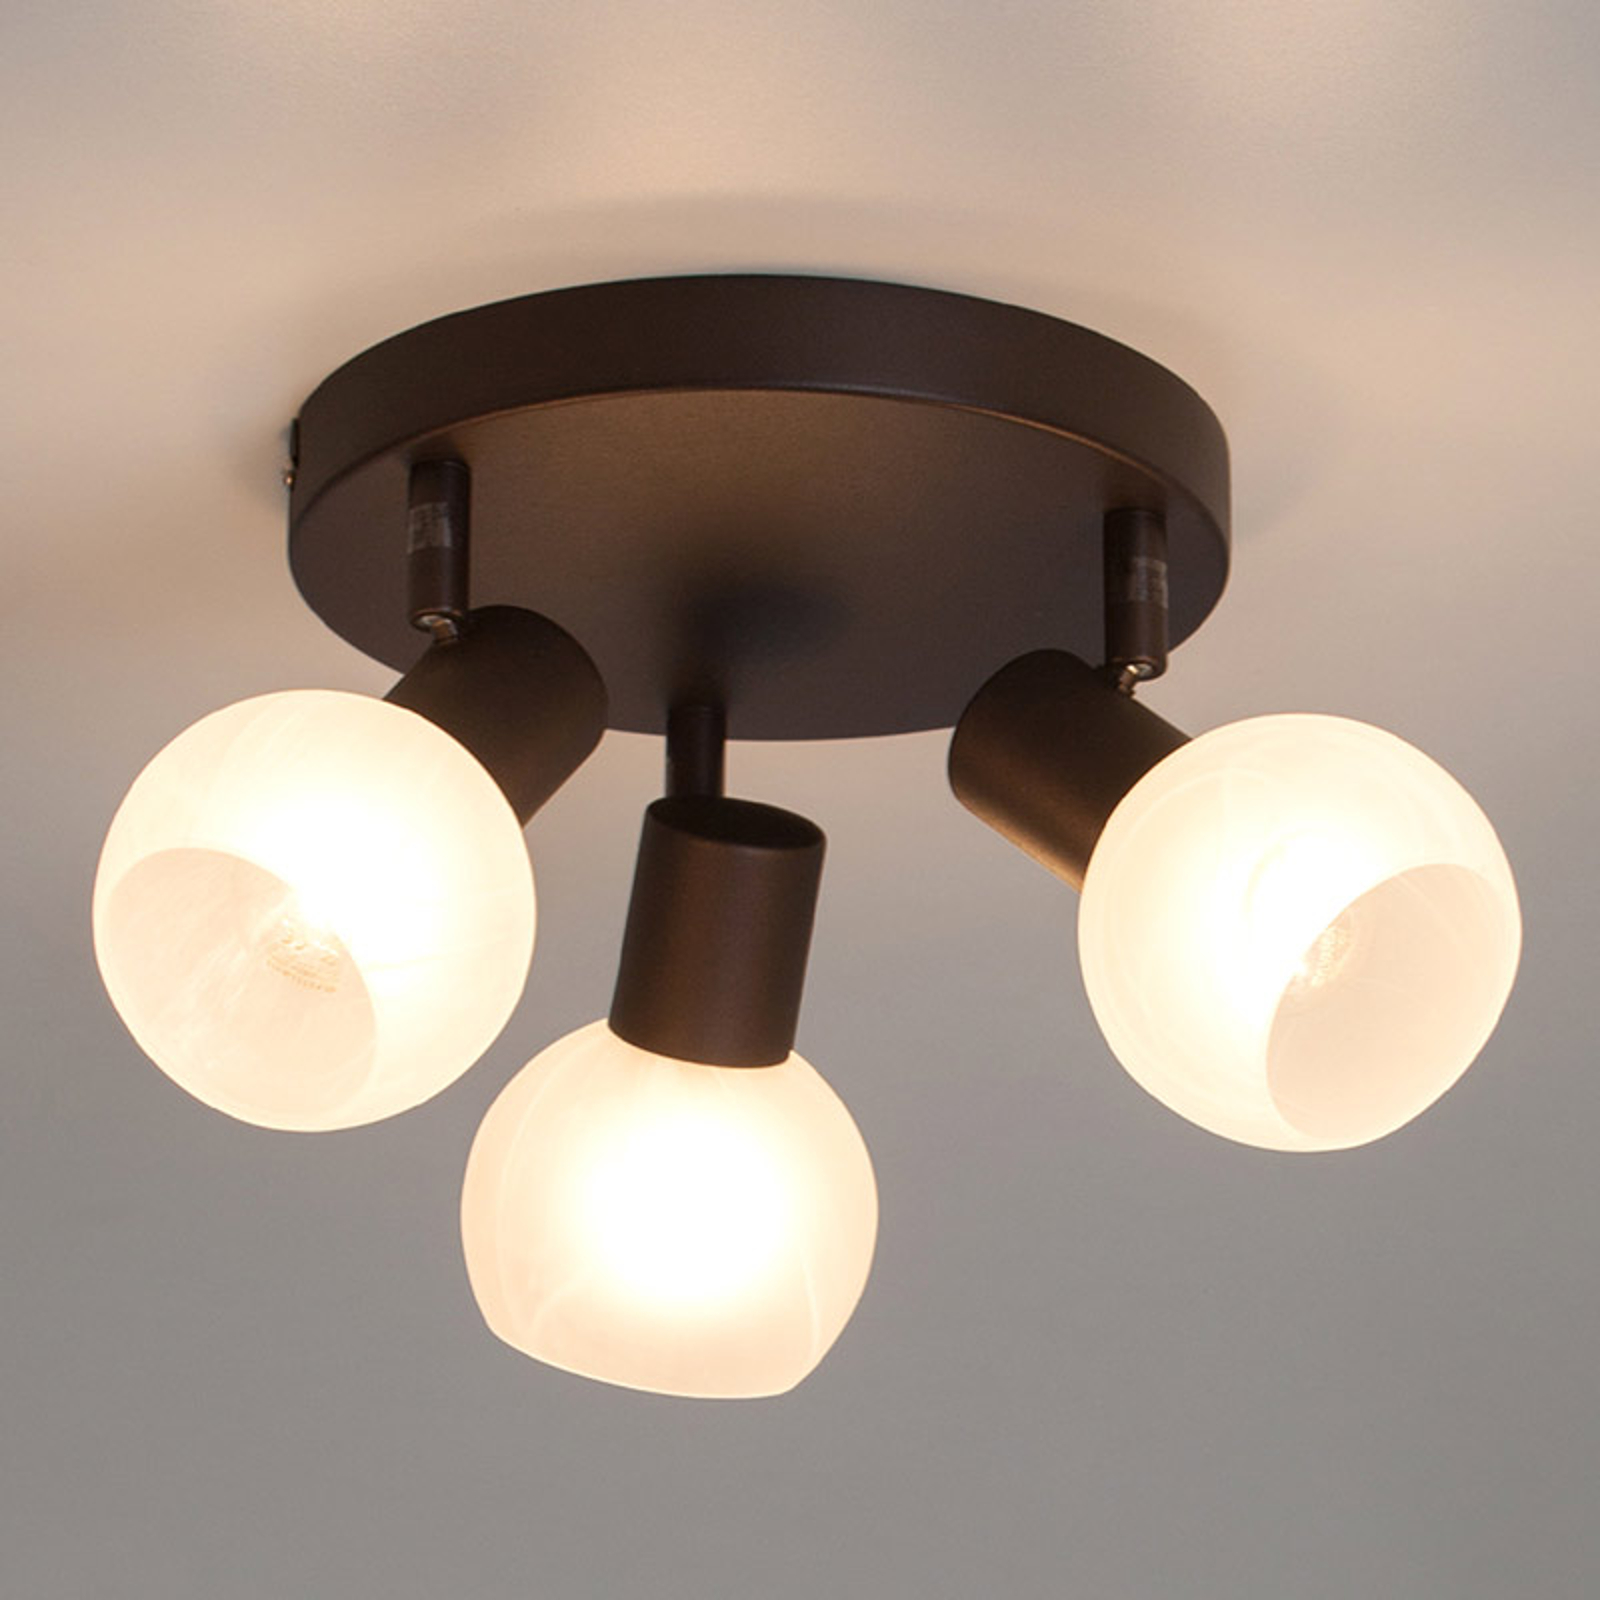 Three-bulb round ceiling spotlight Gabon_1508855_1